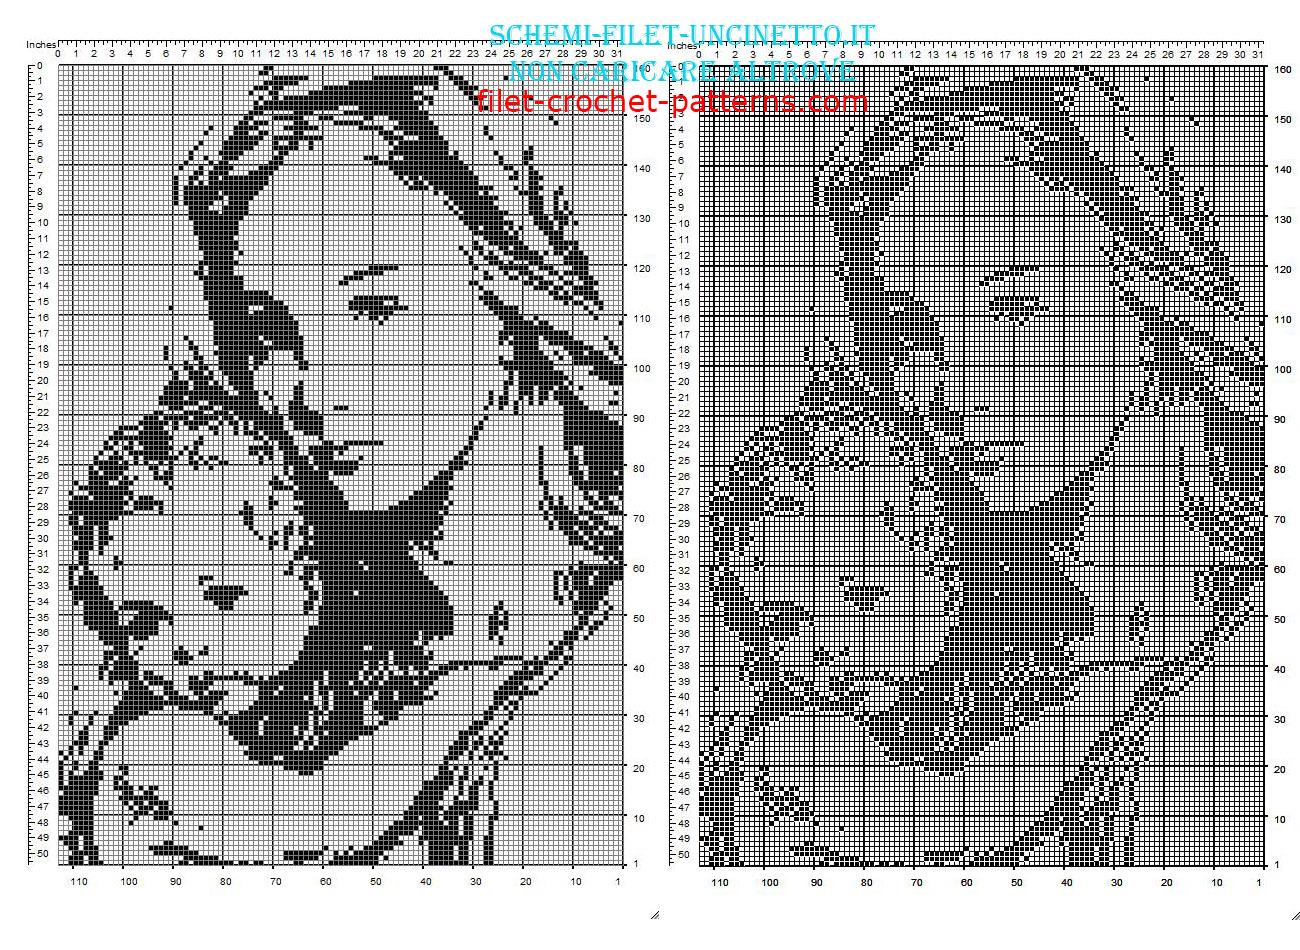 filet crochet free pattern download phprhnl